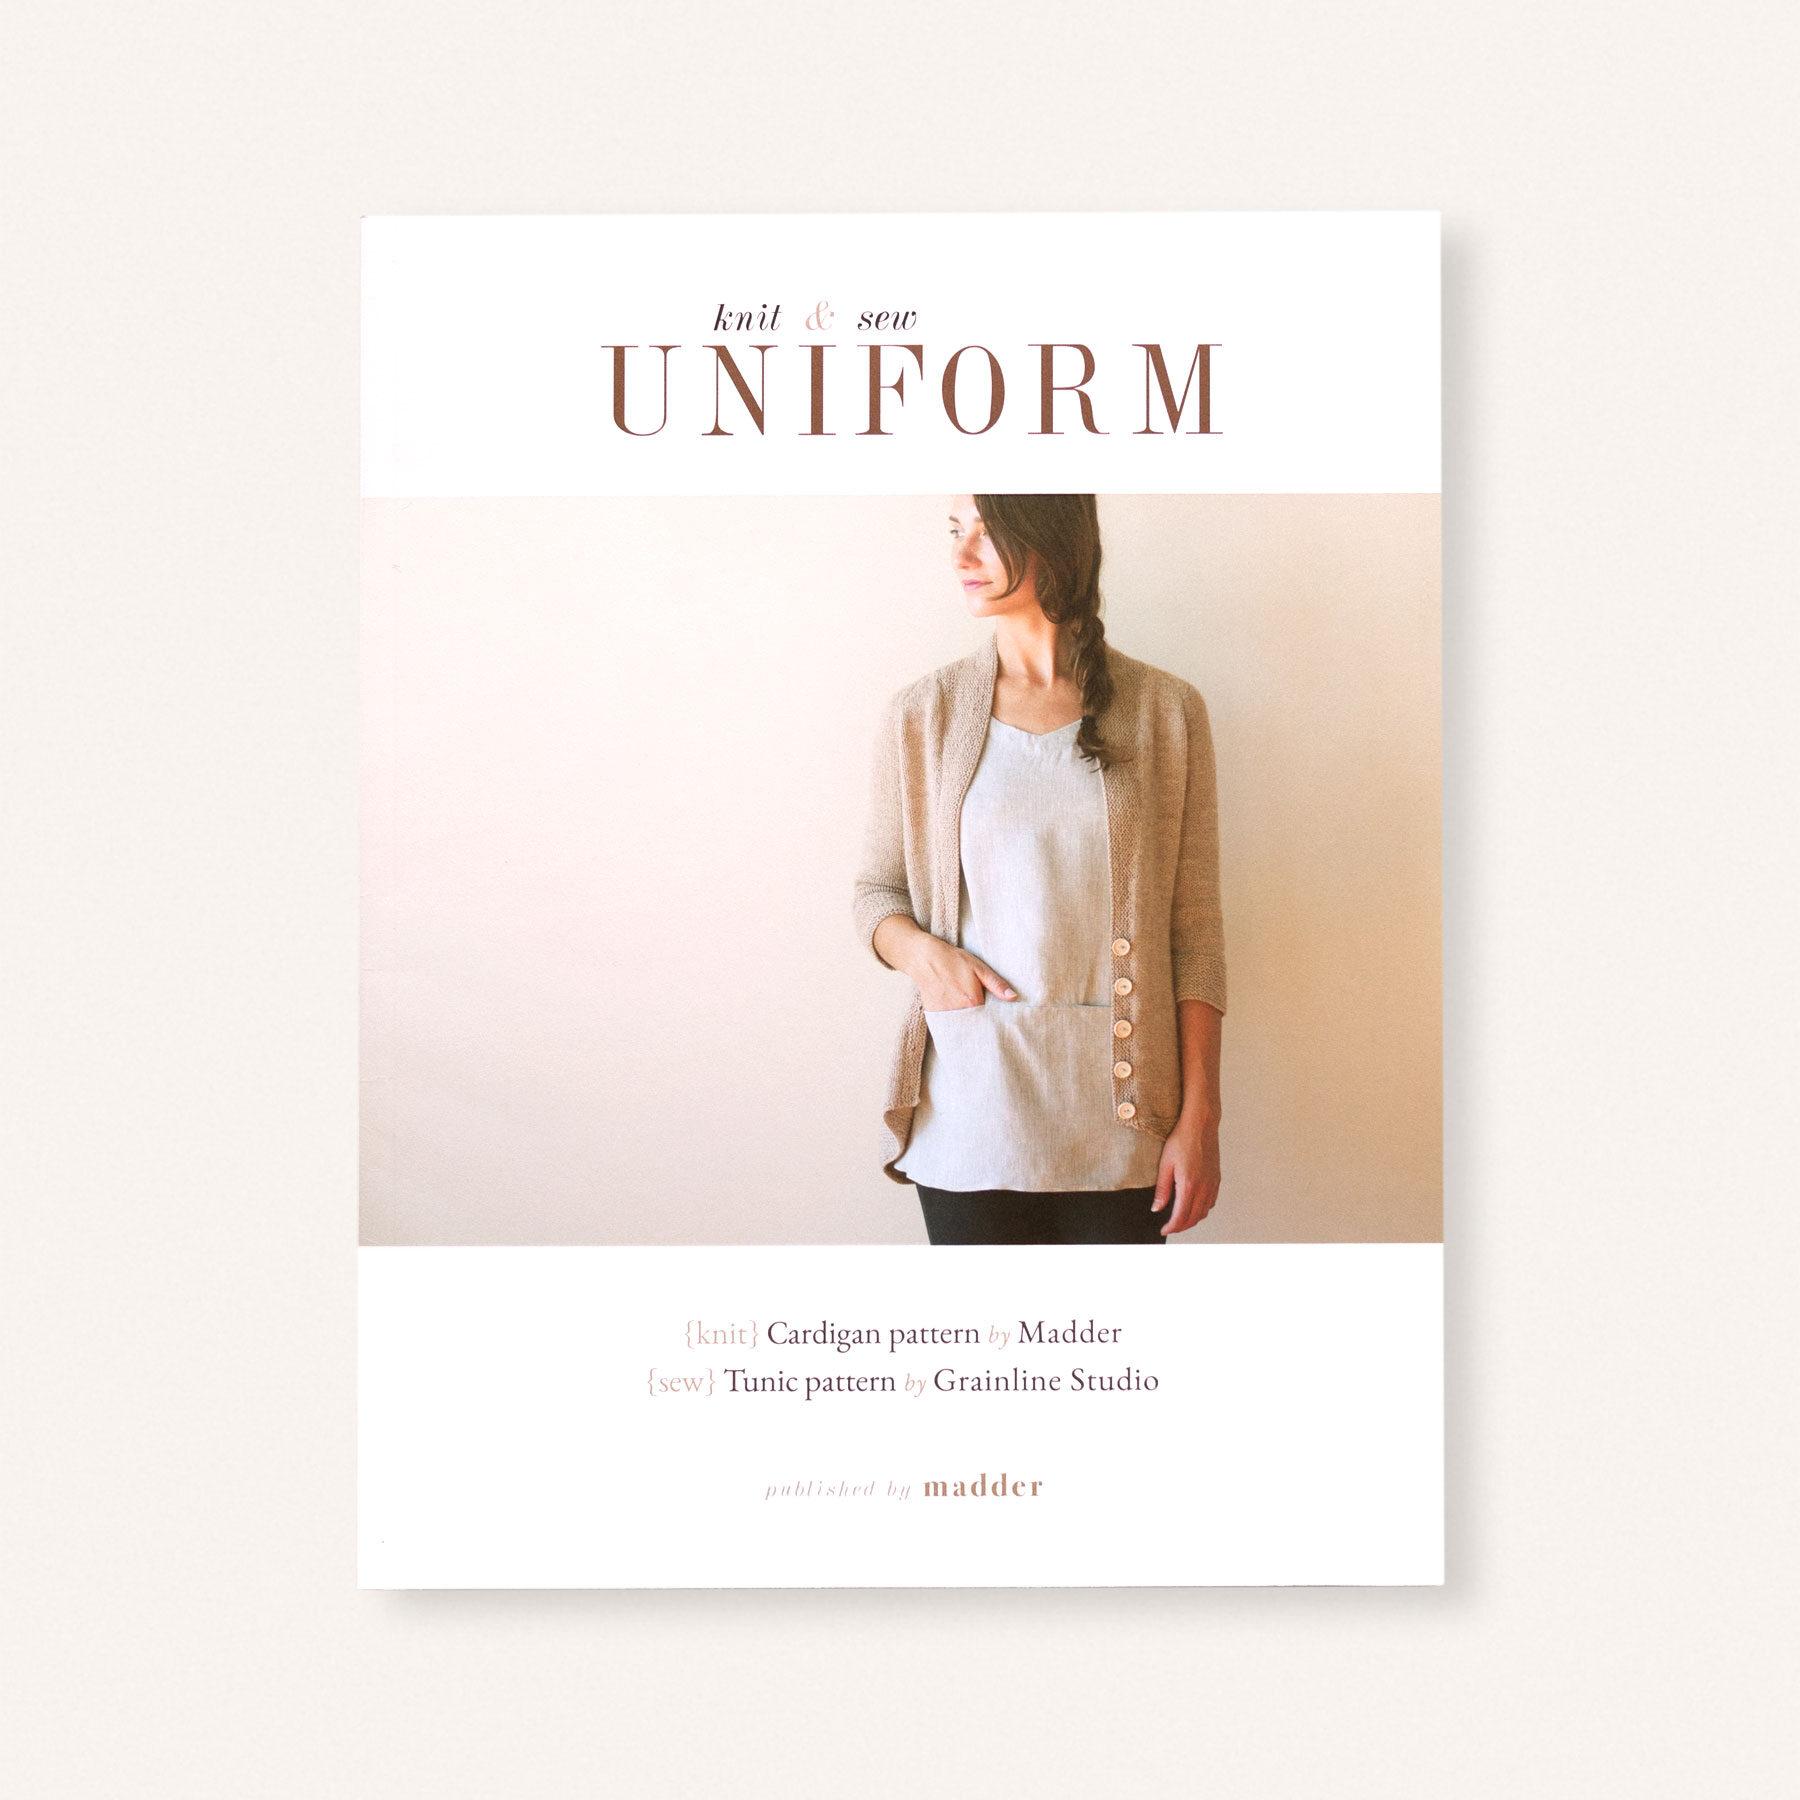 Uniform – Knit & Sew – Book and E-Book | Anna & Juan